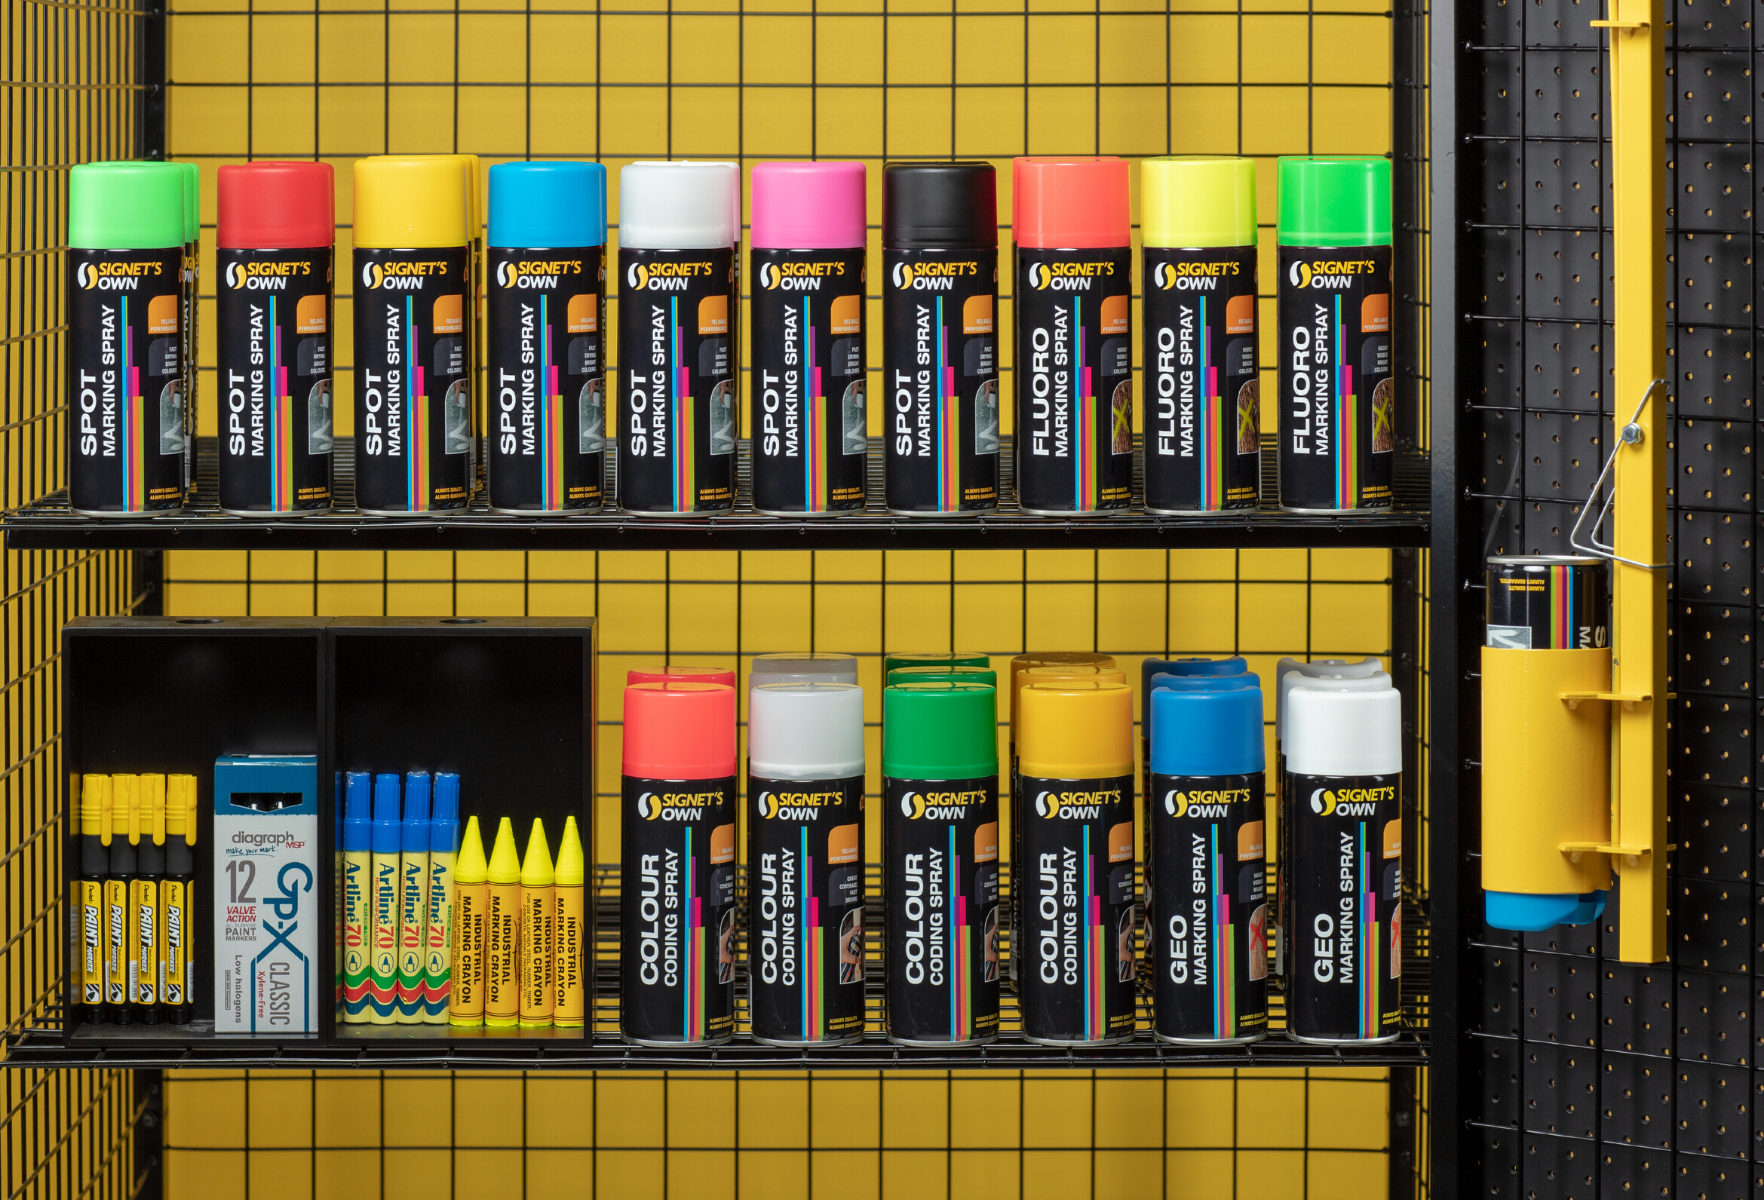 Signet's Colour Coding Spray